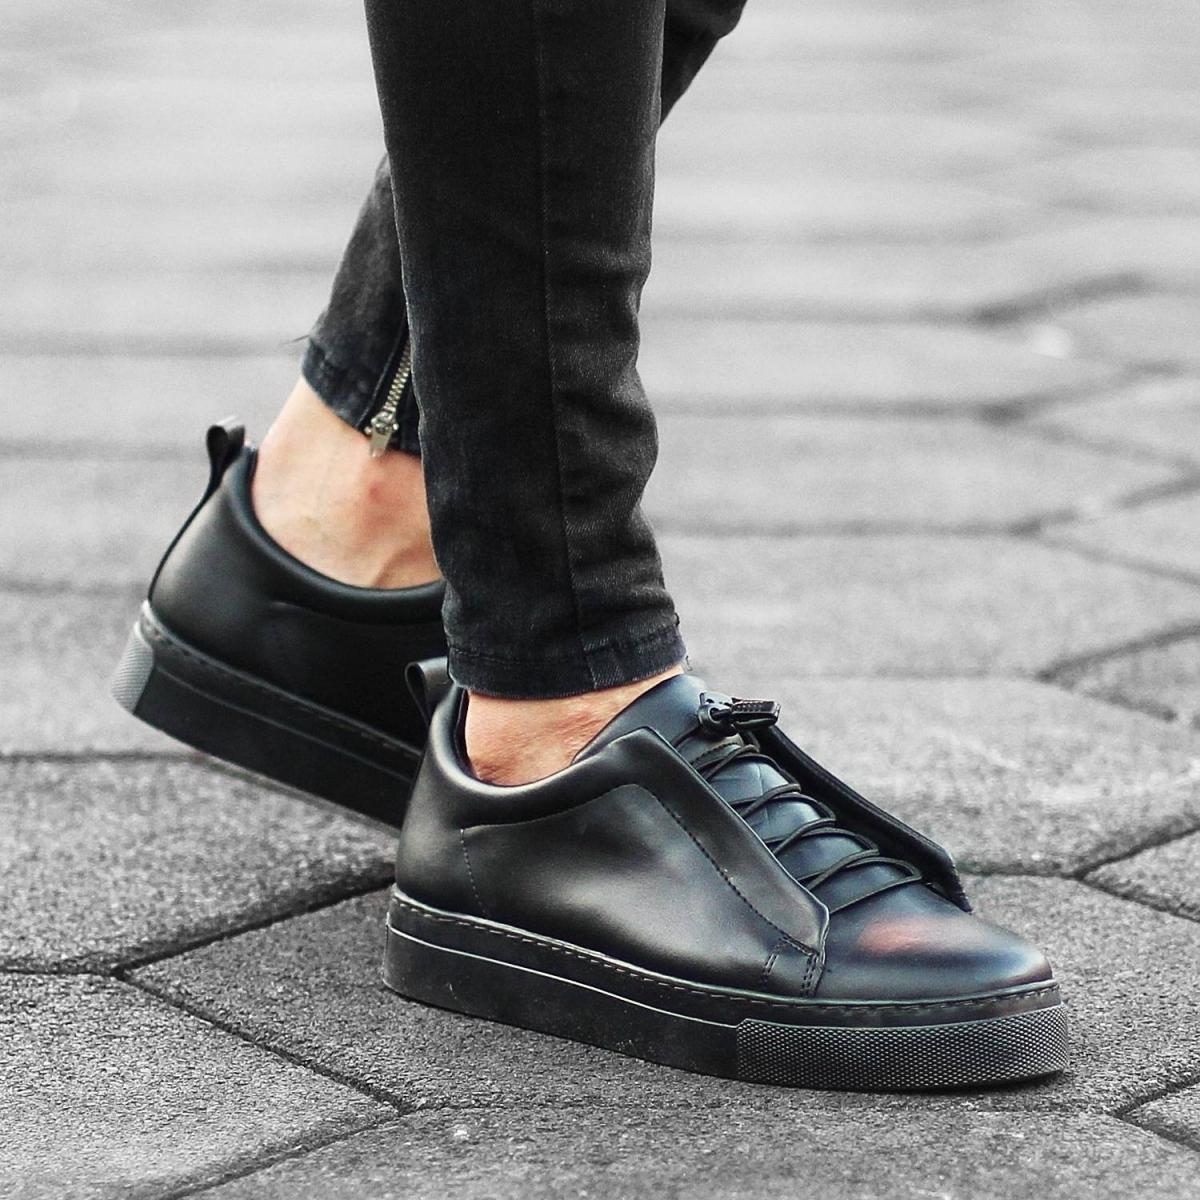 Erkek Comfy Siyah Sneaker Ayakkabı